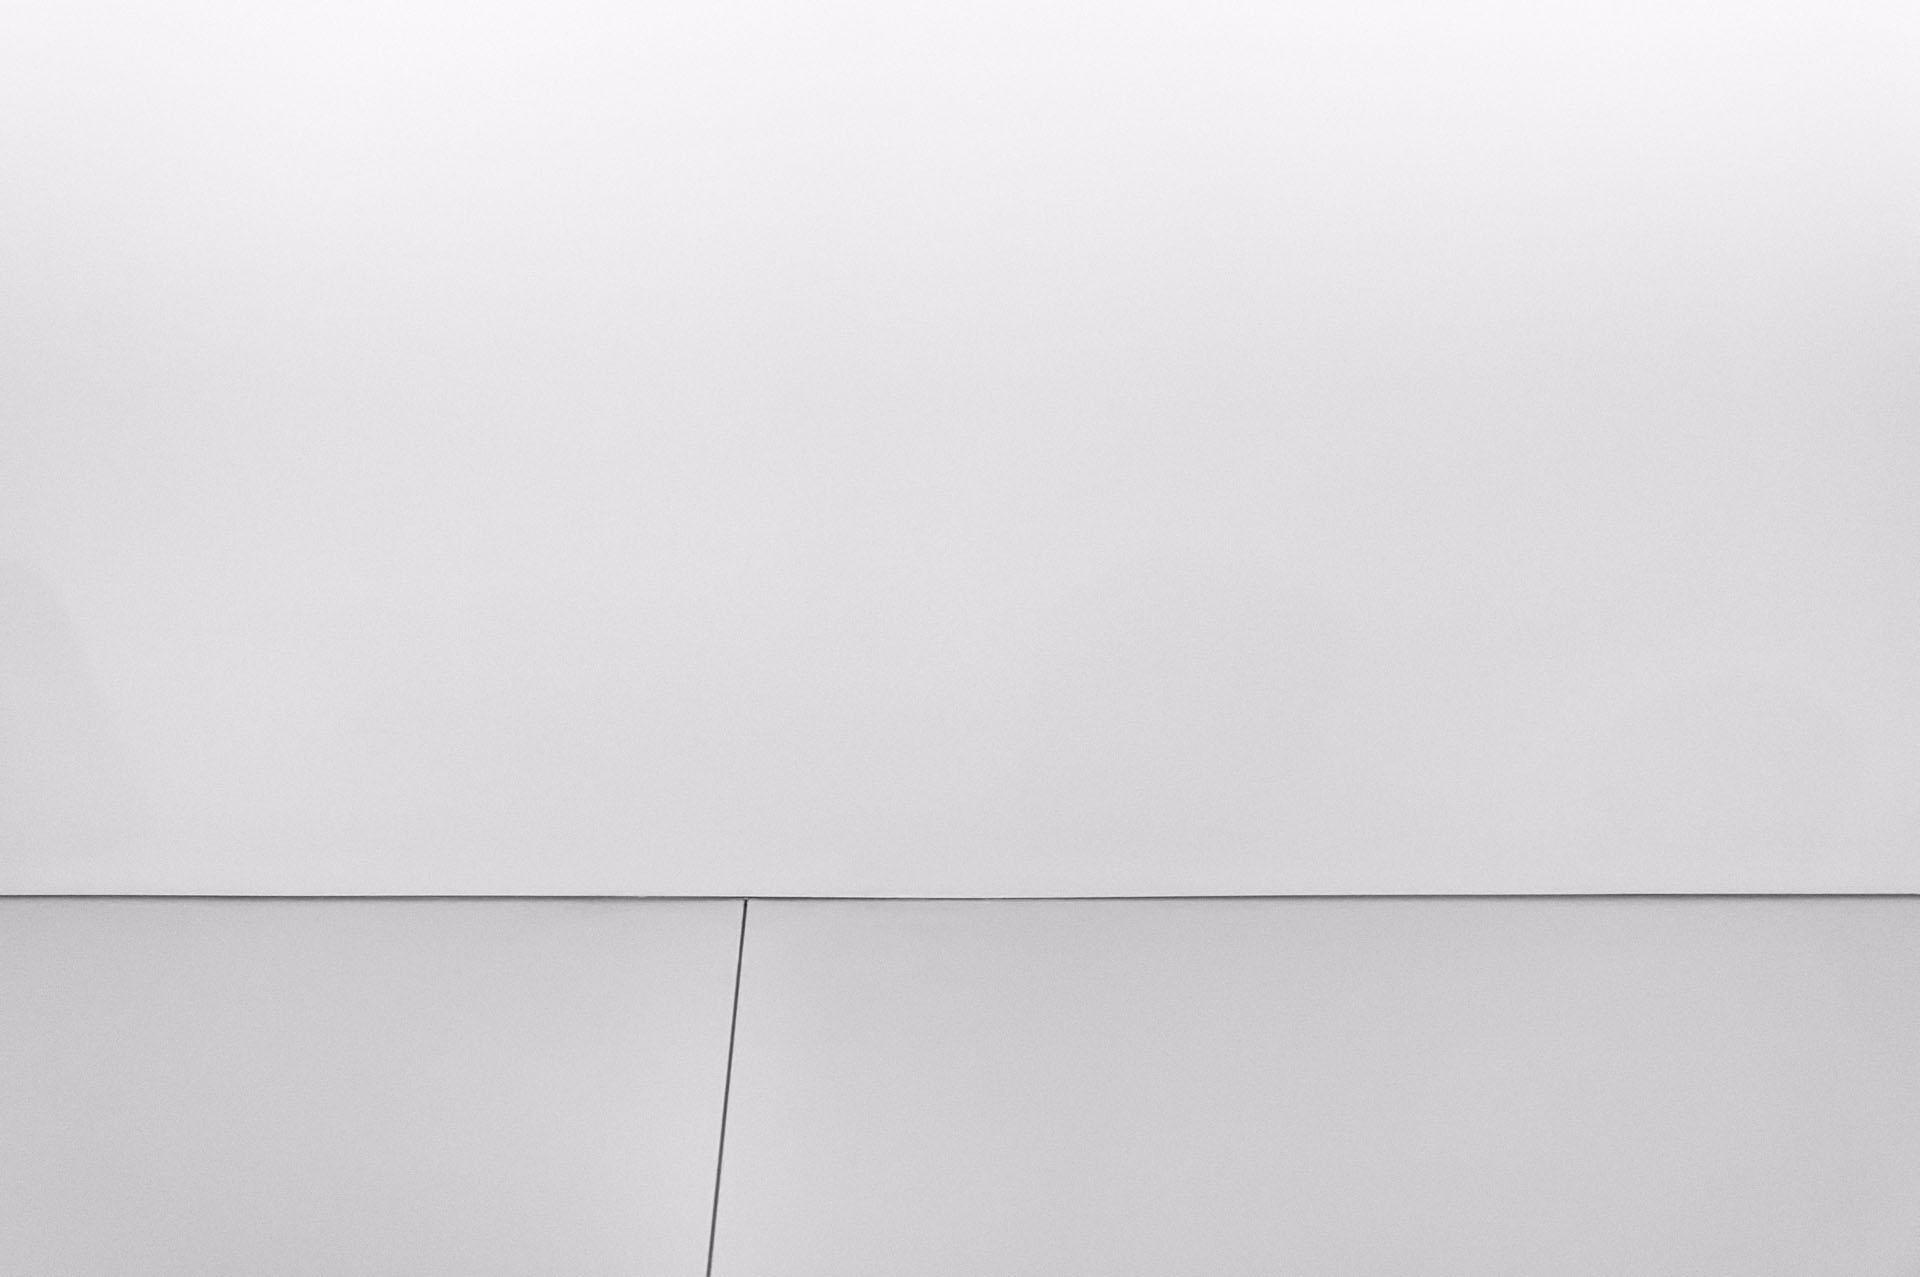 Shape Line minimalist  - photography - scottnorrisphotography   ello